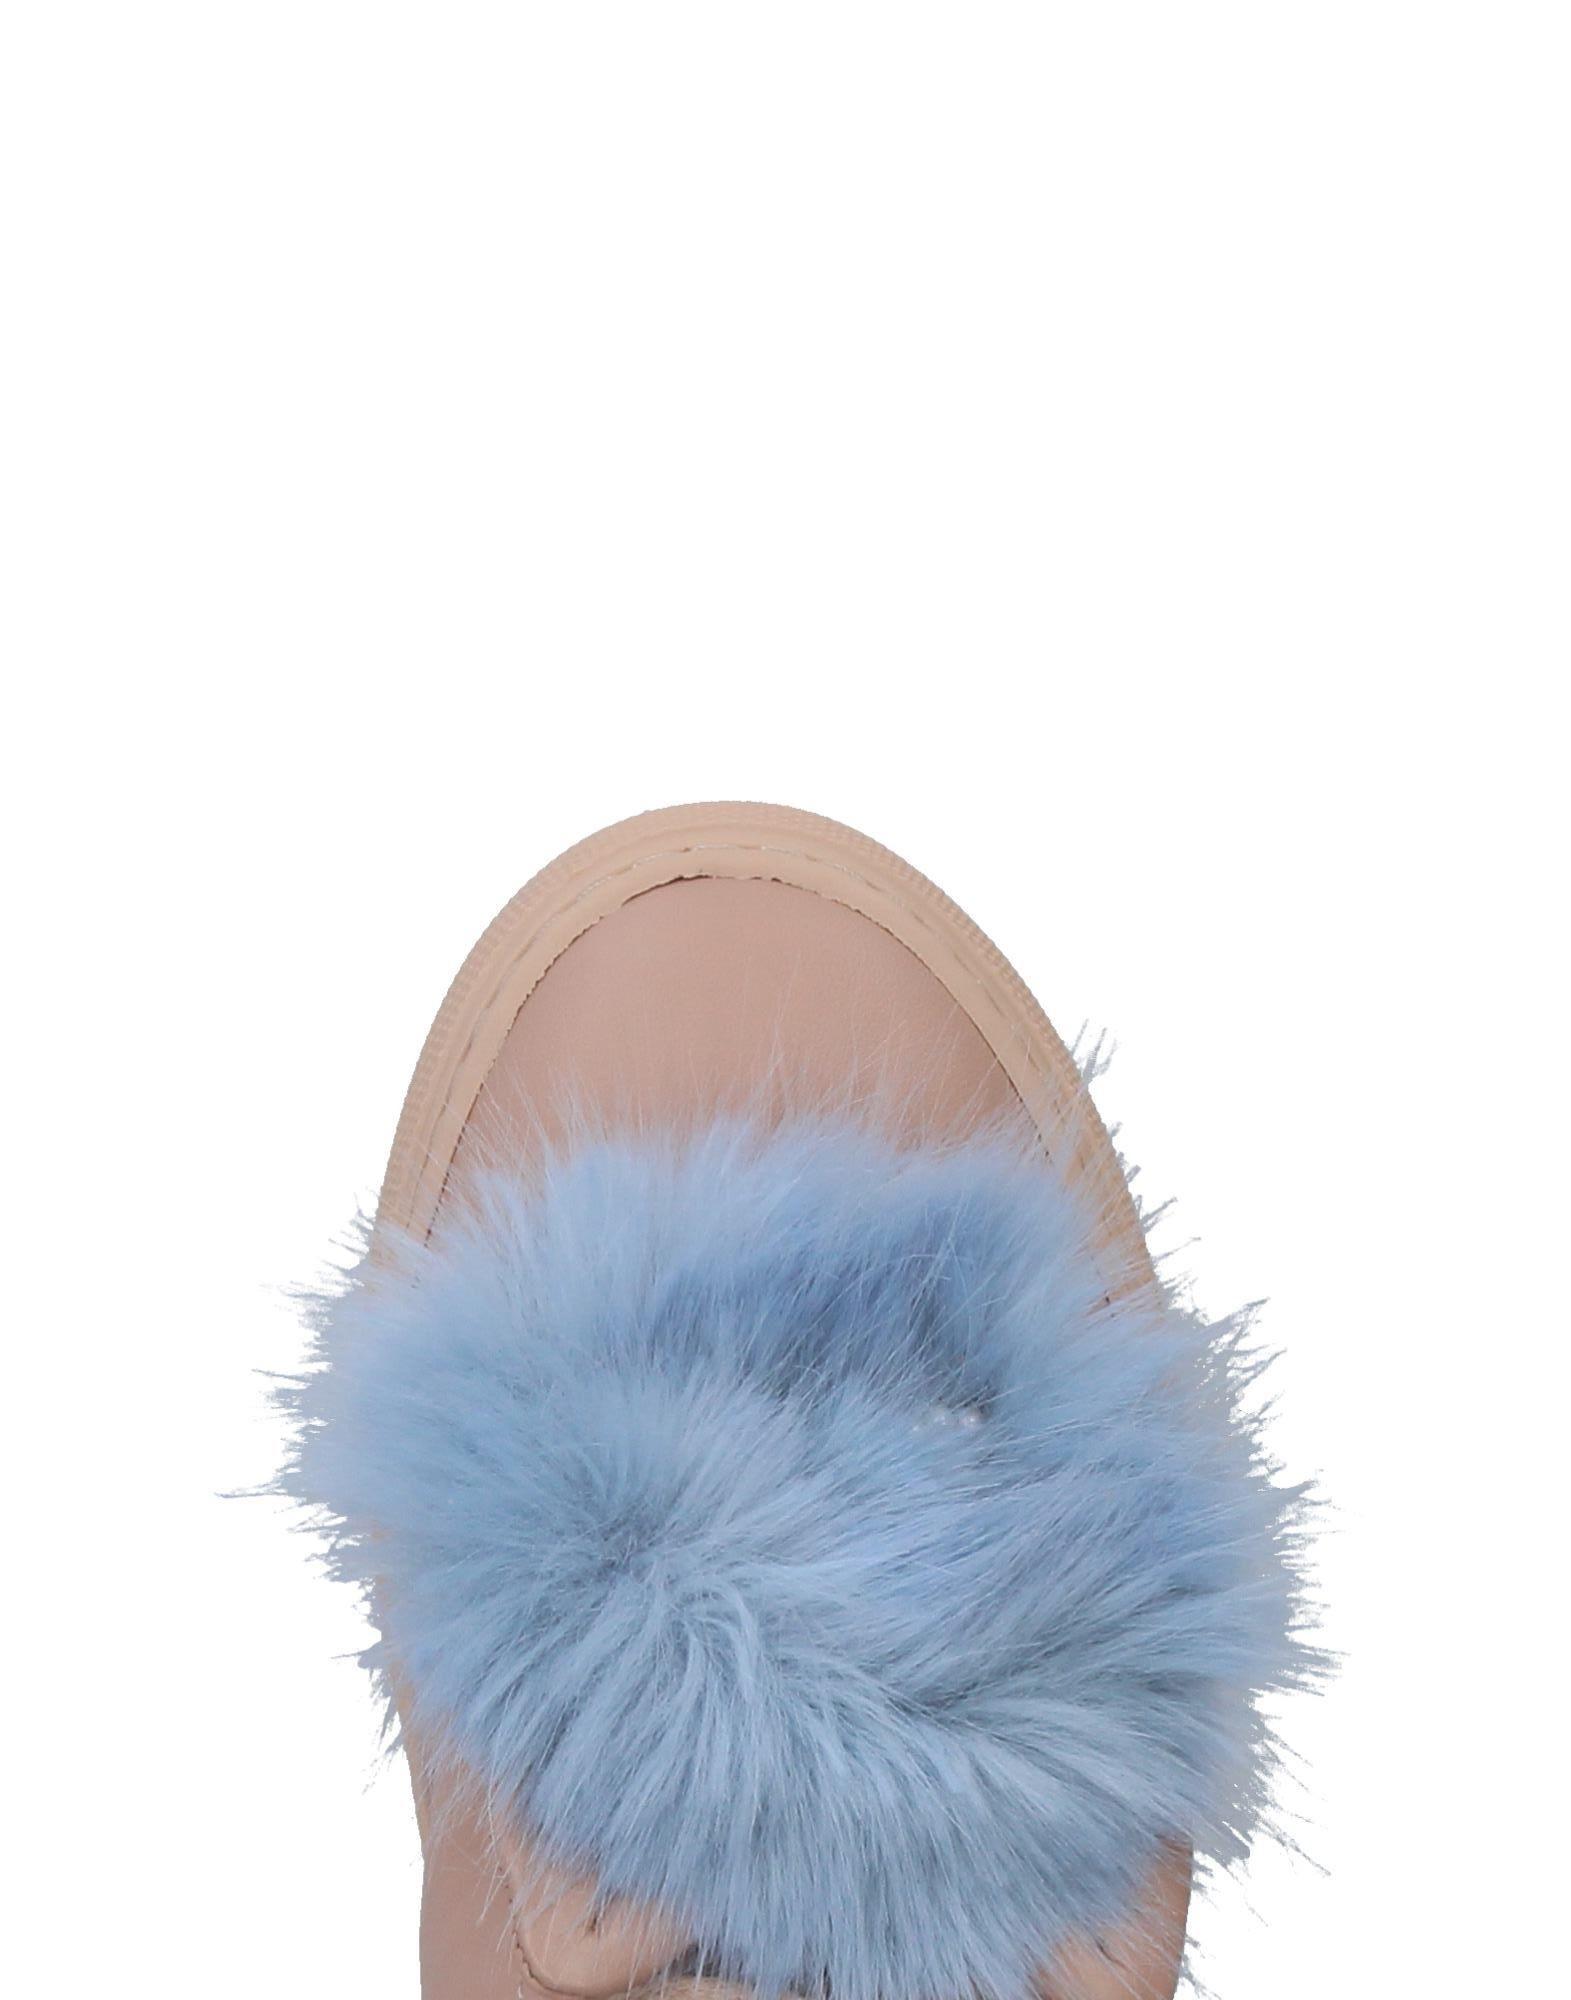 Stilvolle billige Schuhe Josefinas Sneakers Damen  11359220NF 11359220NF 11359220NF 6e723a